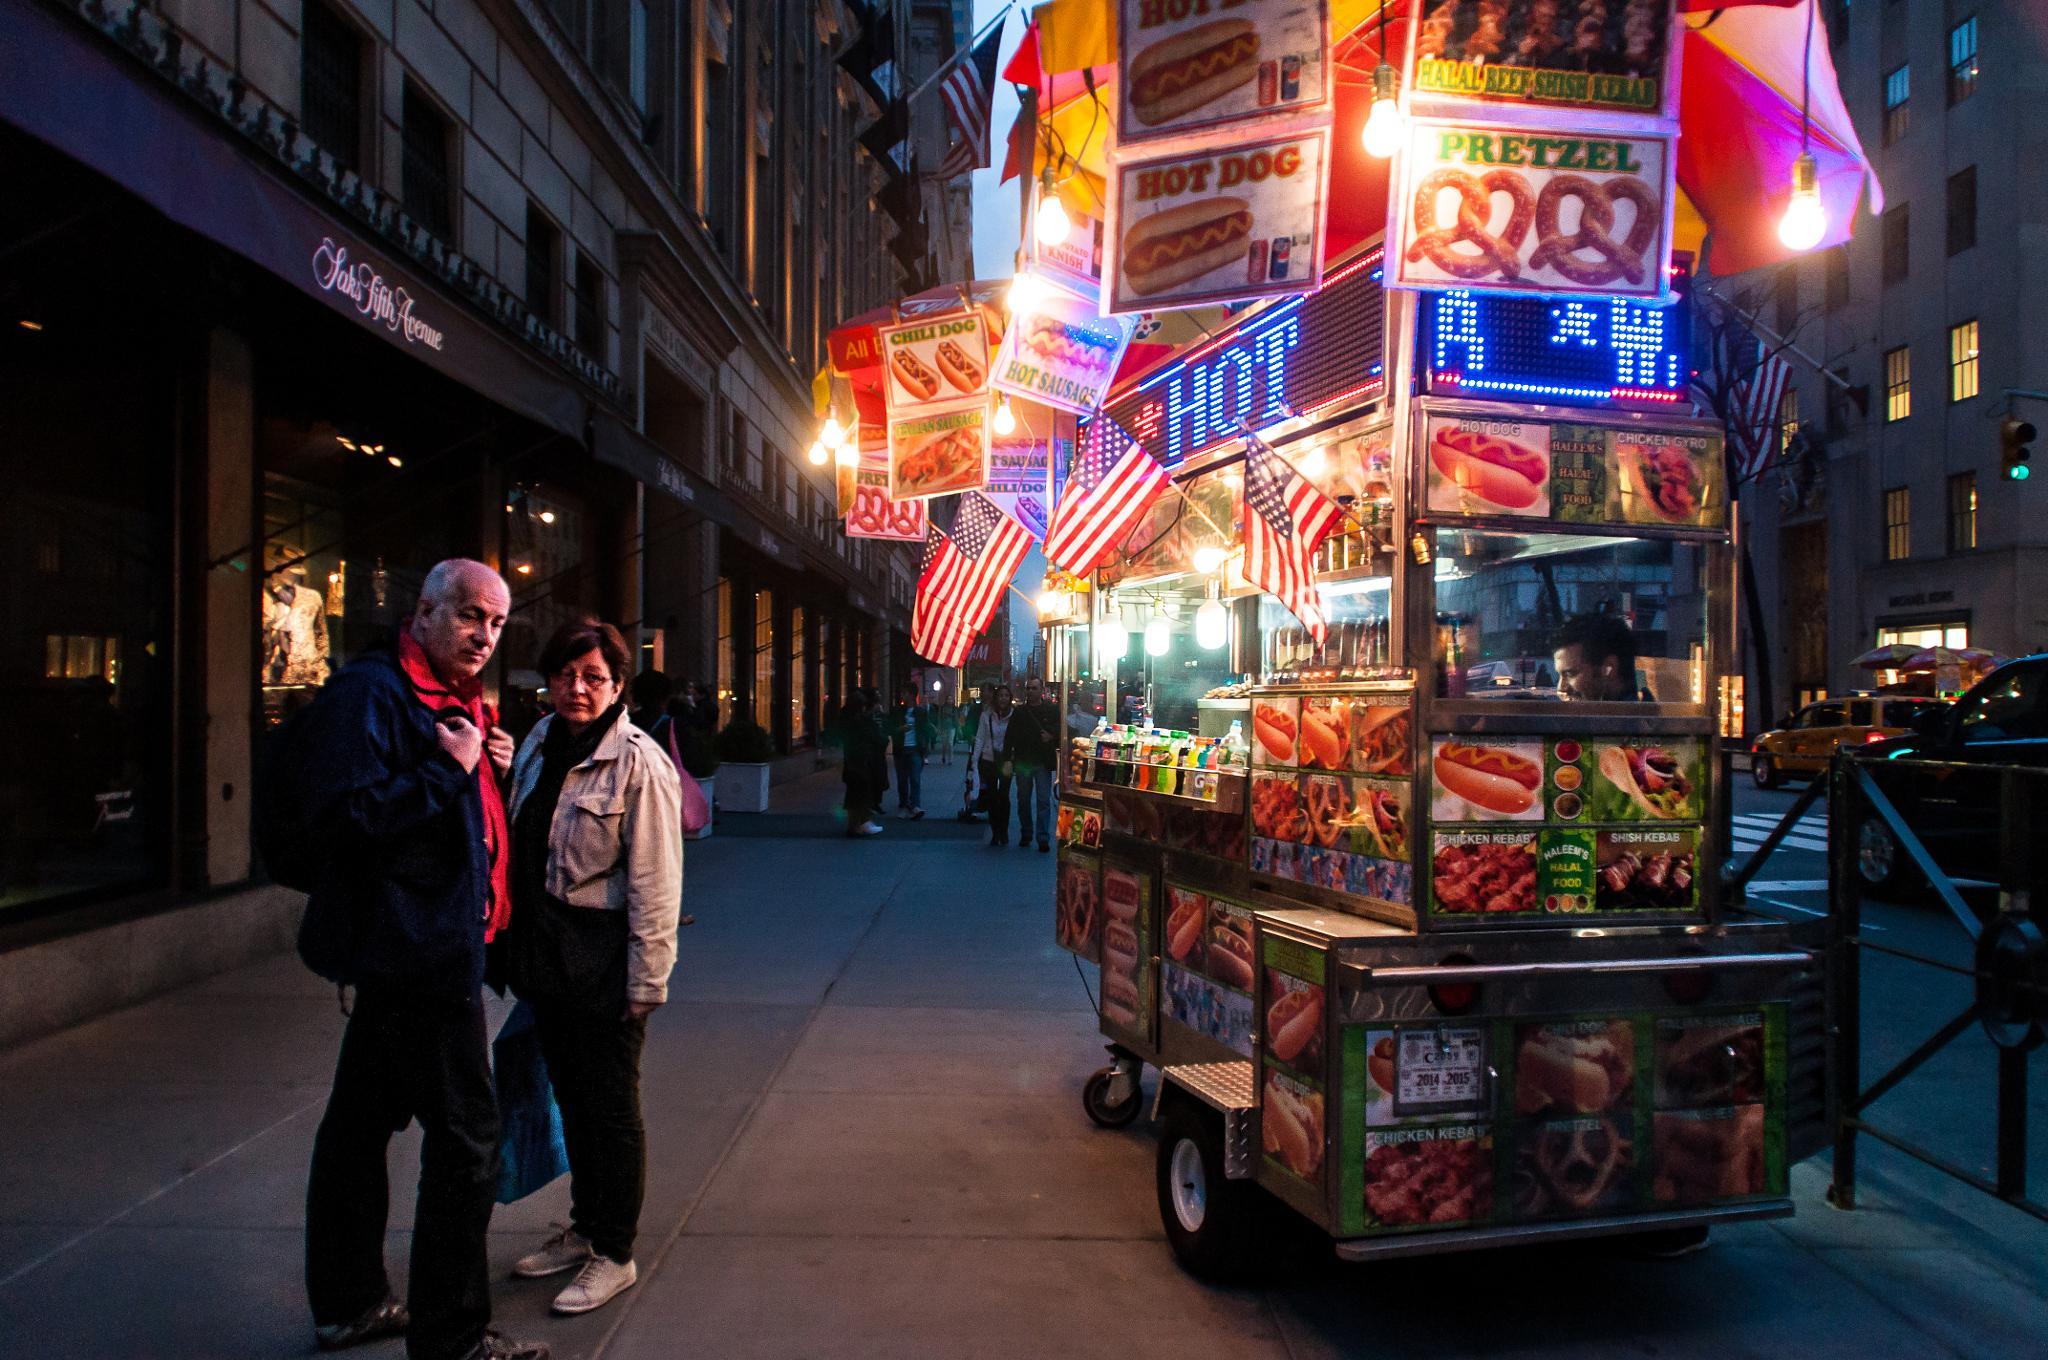 NYC photo walk by Ken Soliman